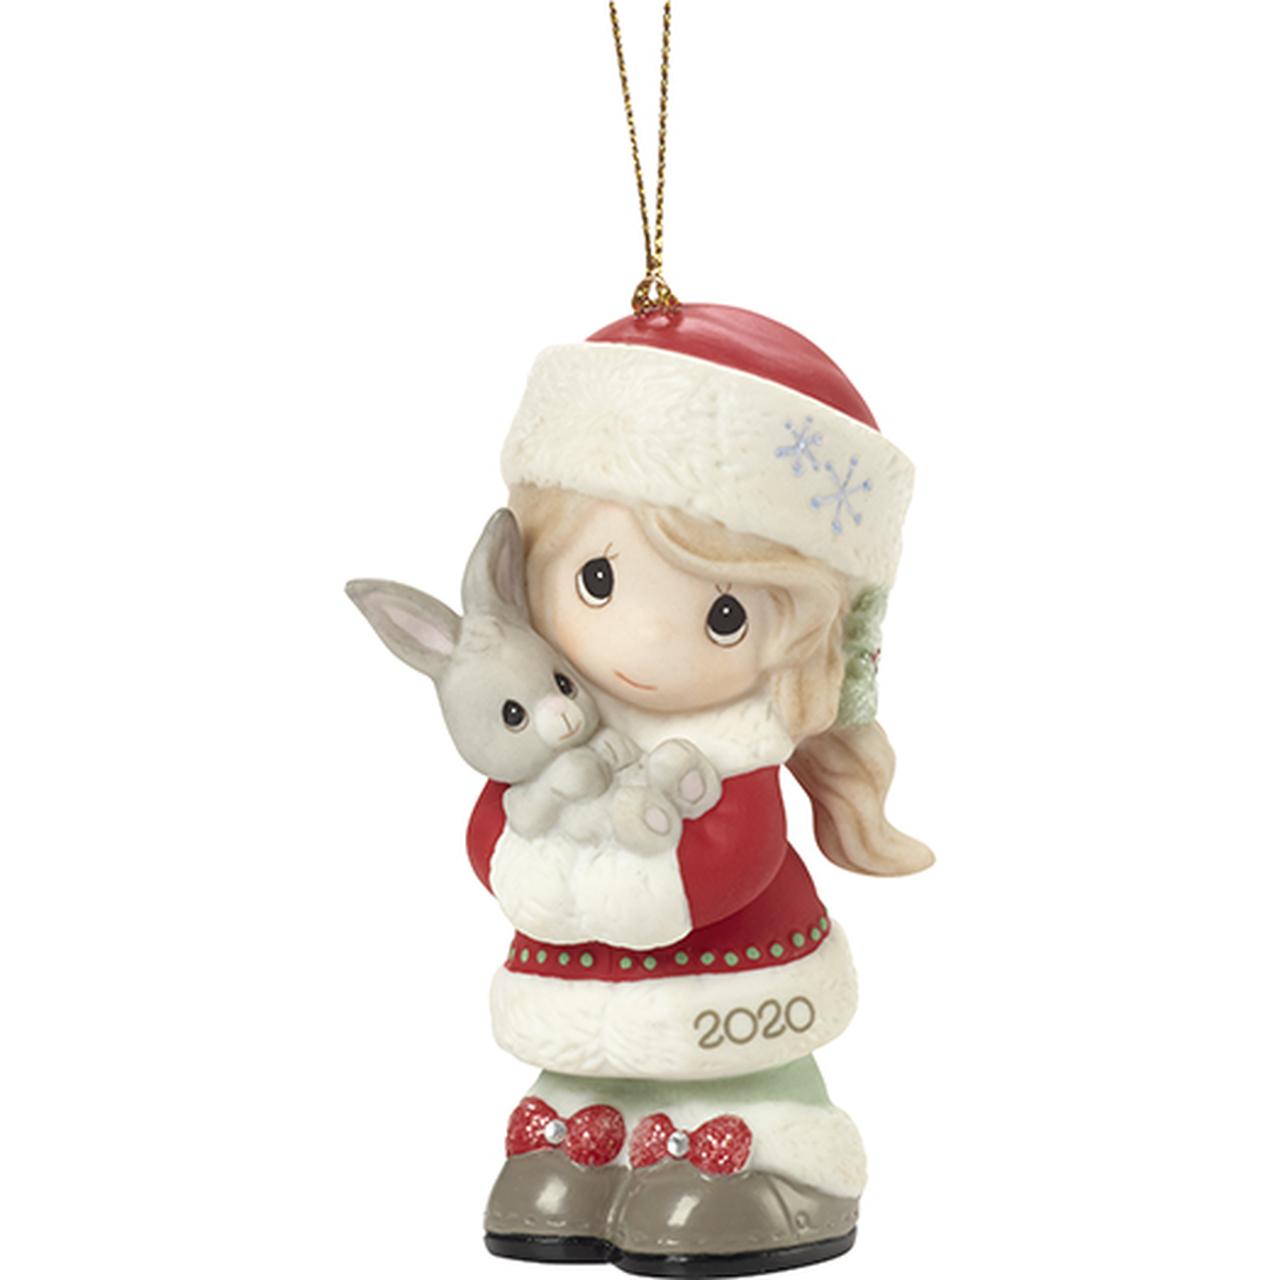 Dated Christmas Ornaments 2020 2020 Every Bunny Loves a Christmas Hug, Girl   Dated Precious